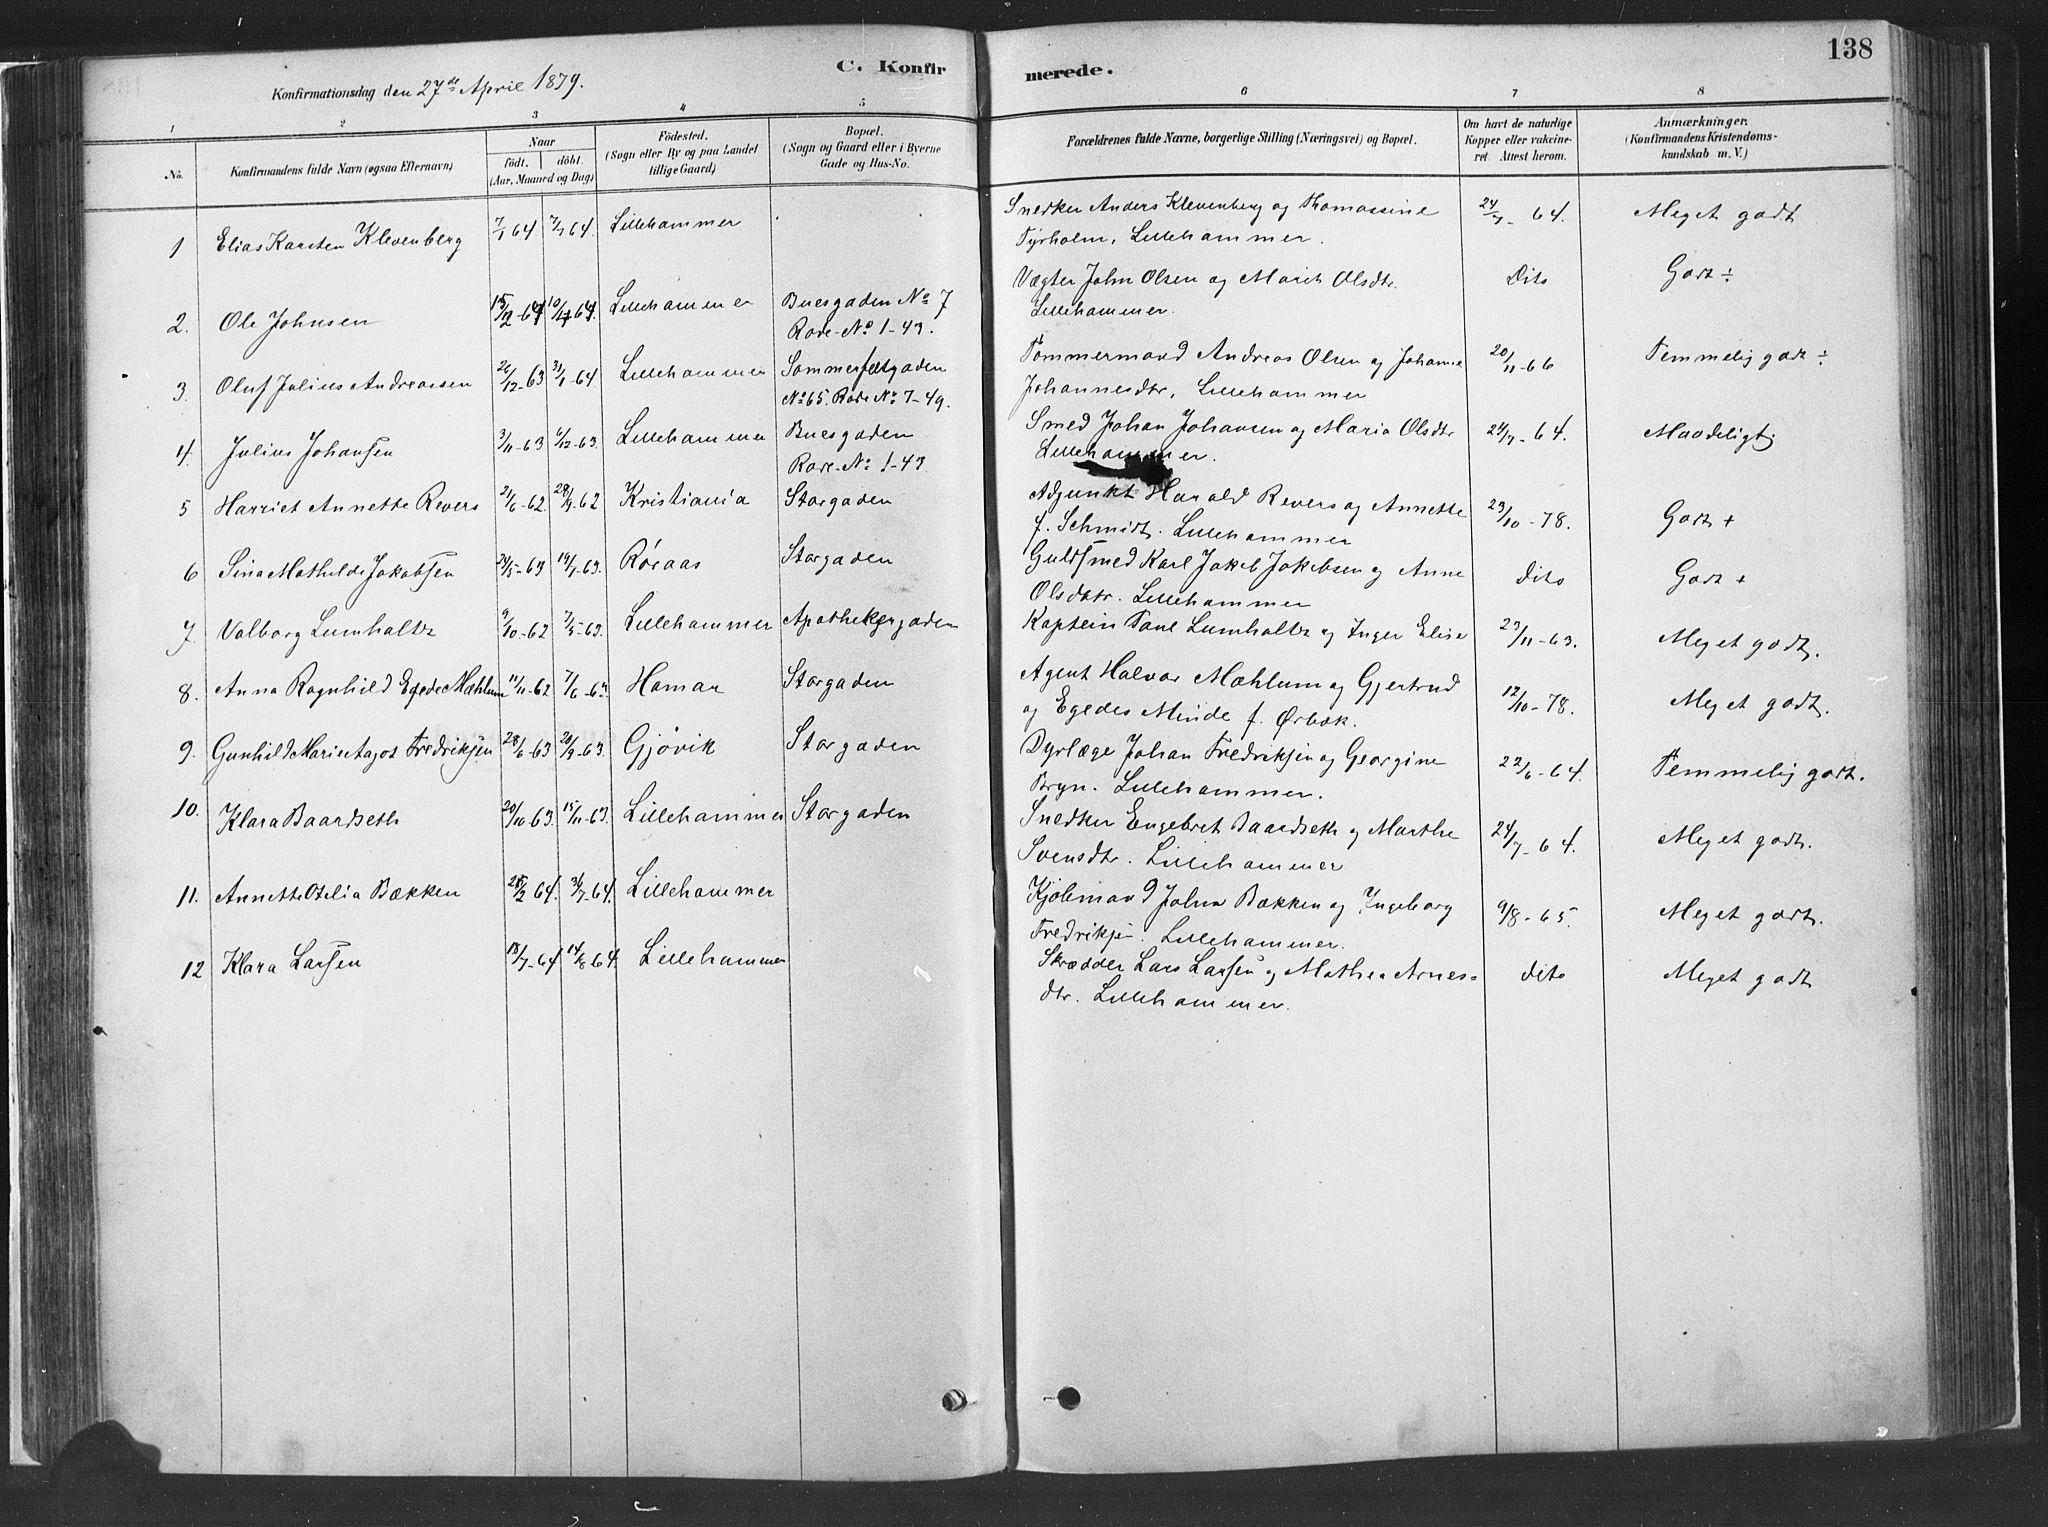 SAH, Fåberg prestekontor, H/Ha/Haa/L0010: Parish register (official) no. 10, 1879-1900, p. 138